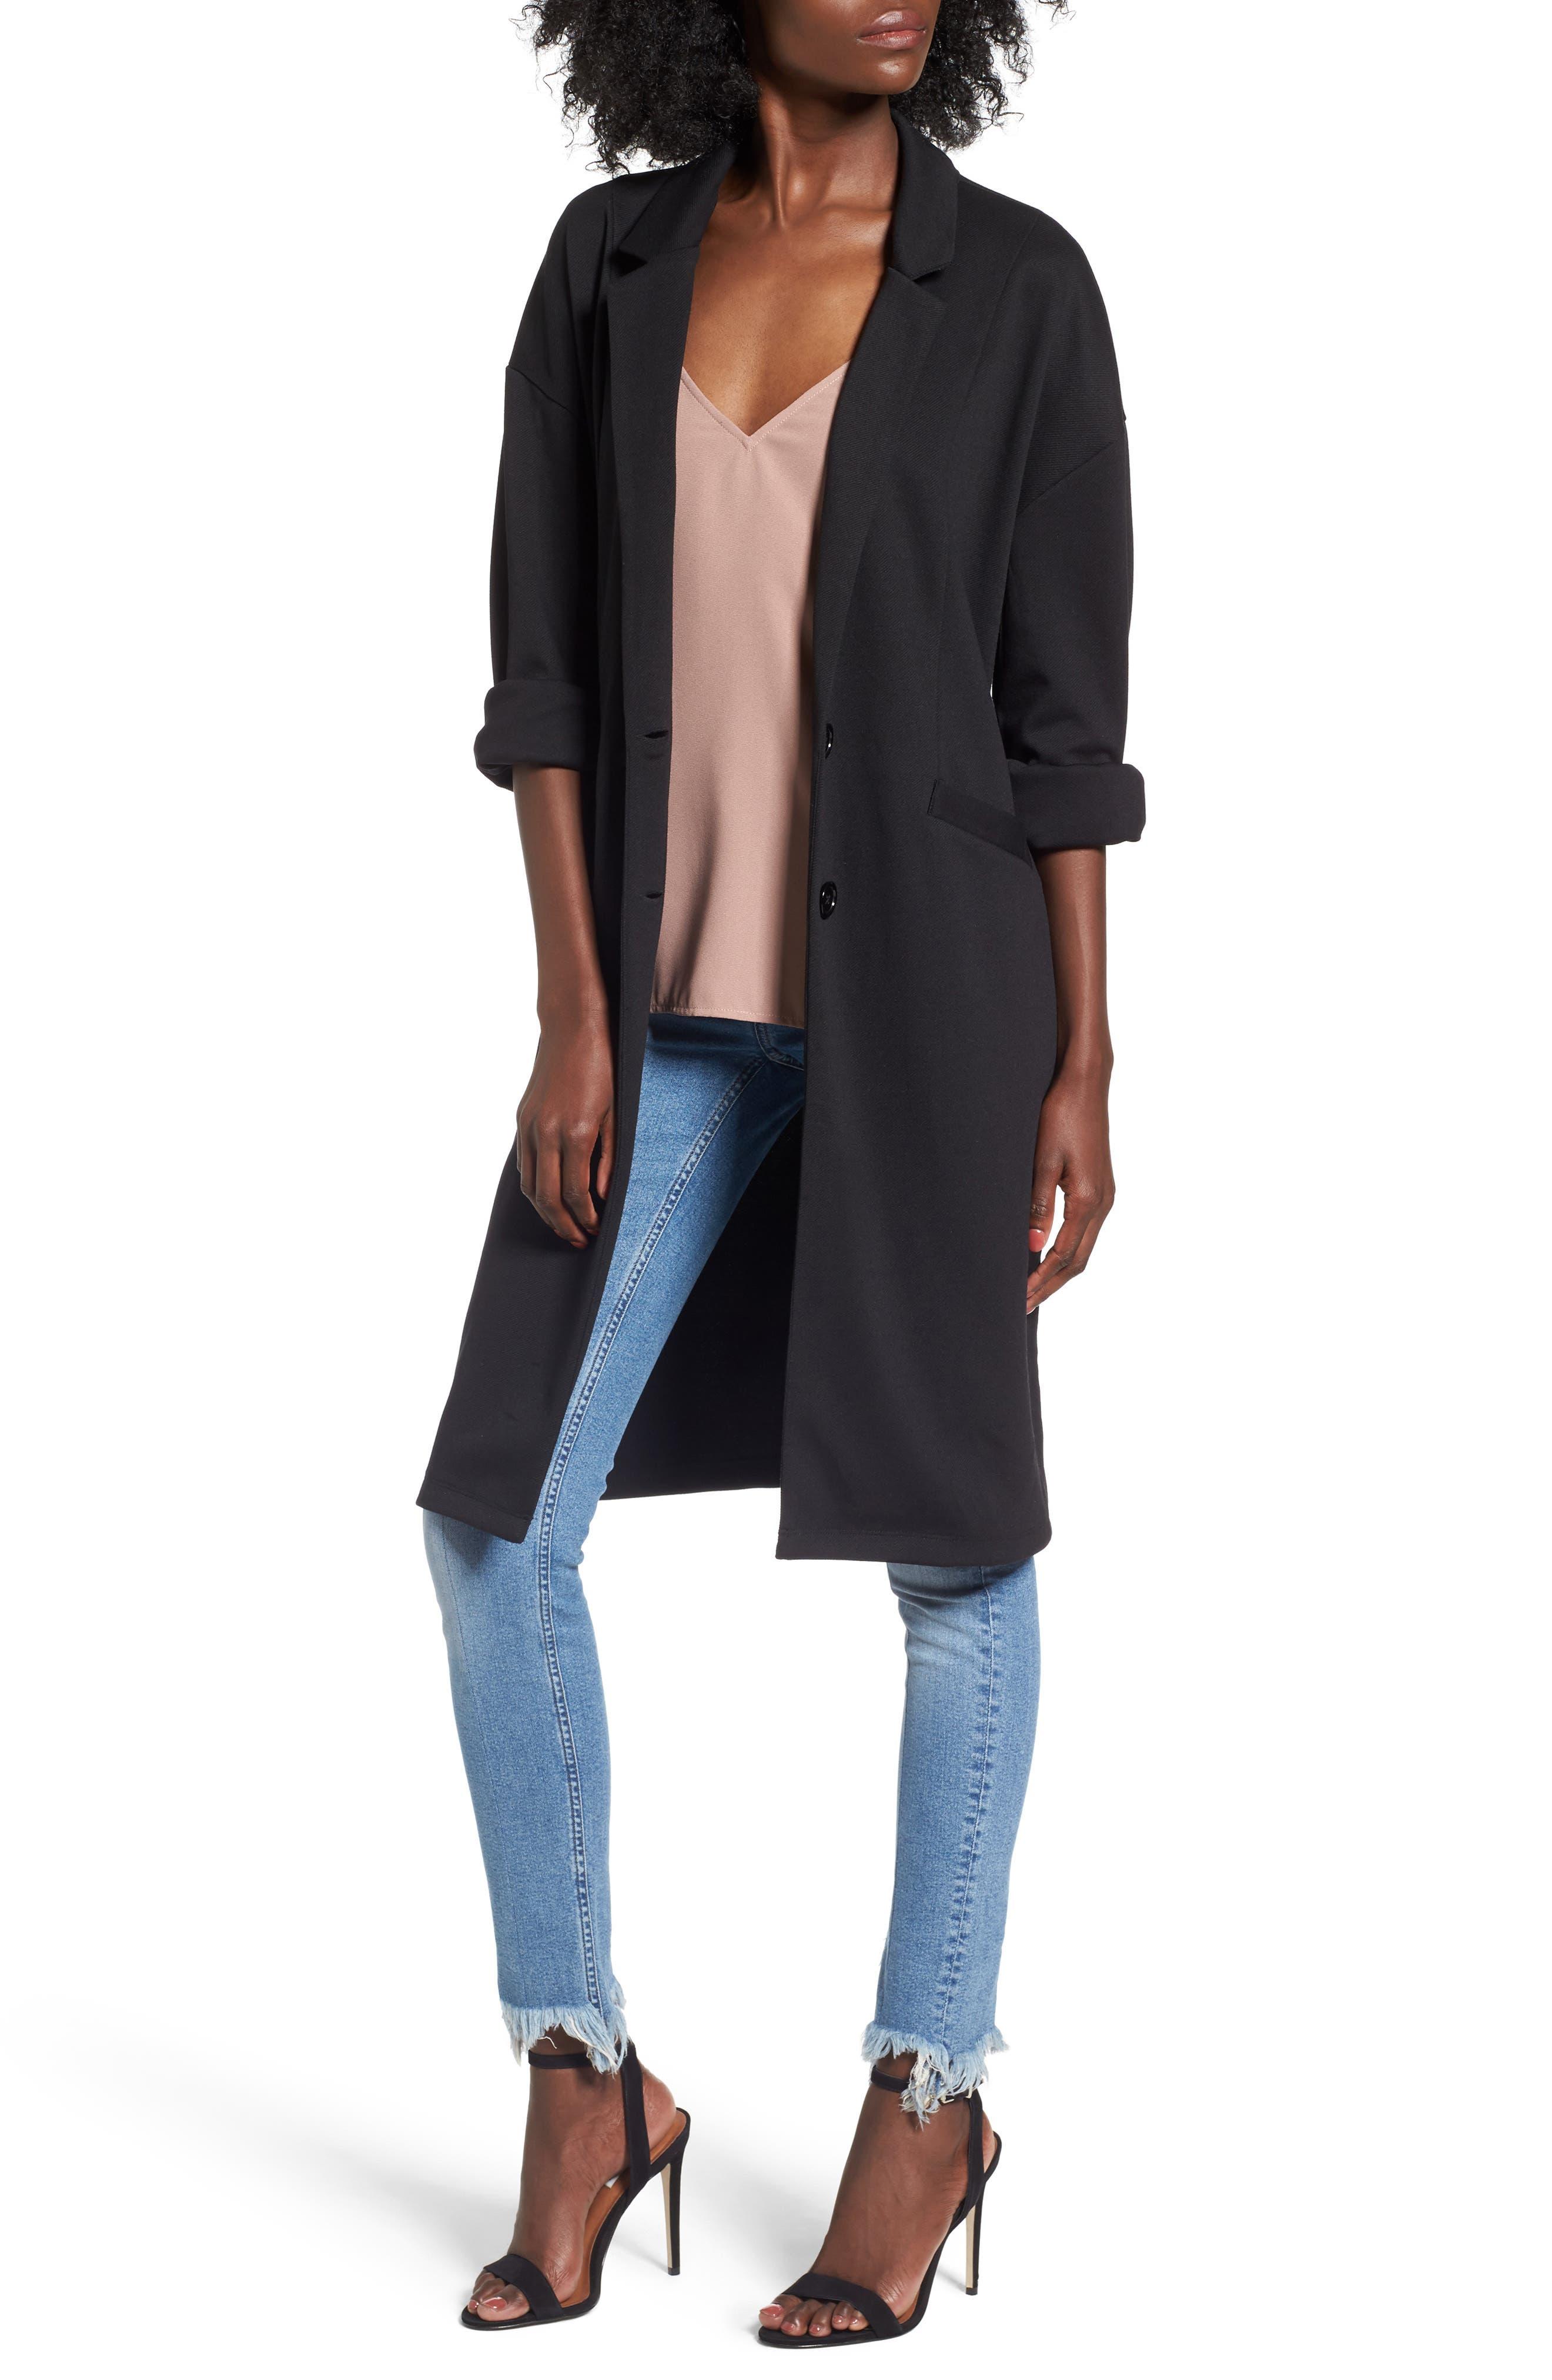 Women's Blazers Work Clothing | Nordstrom